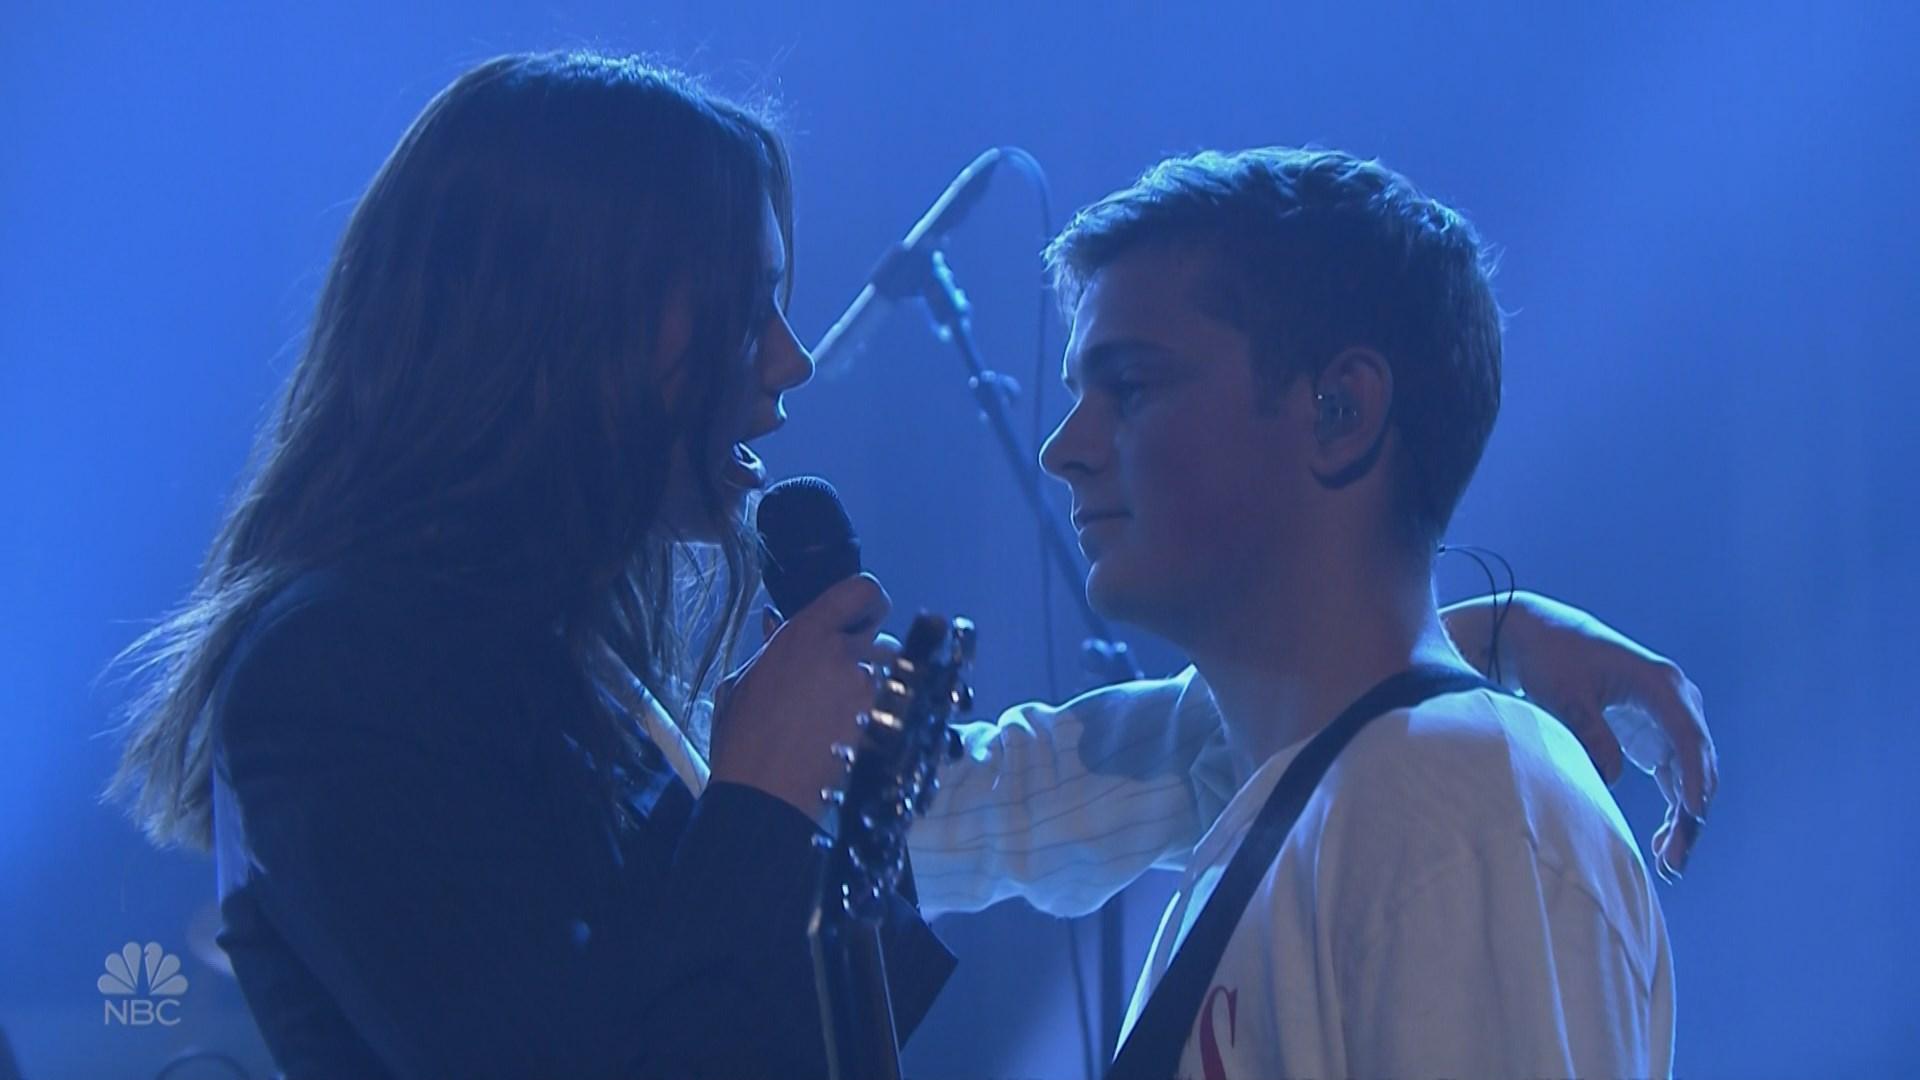 HDTV - Martin Garrix & Dua Lipa - Scared To Be Lonely